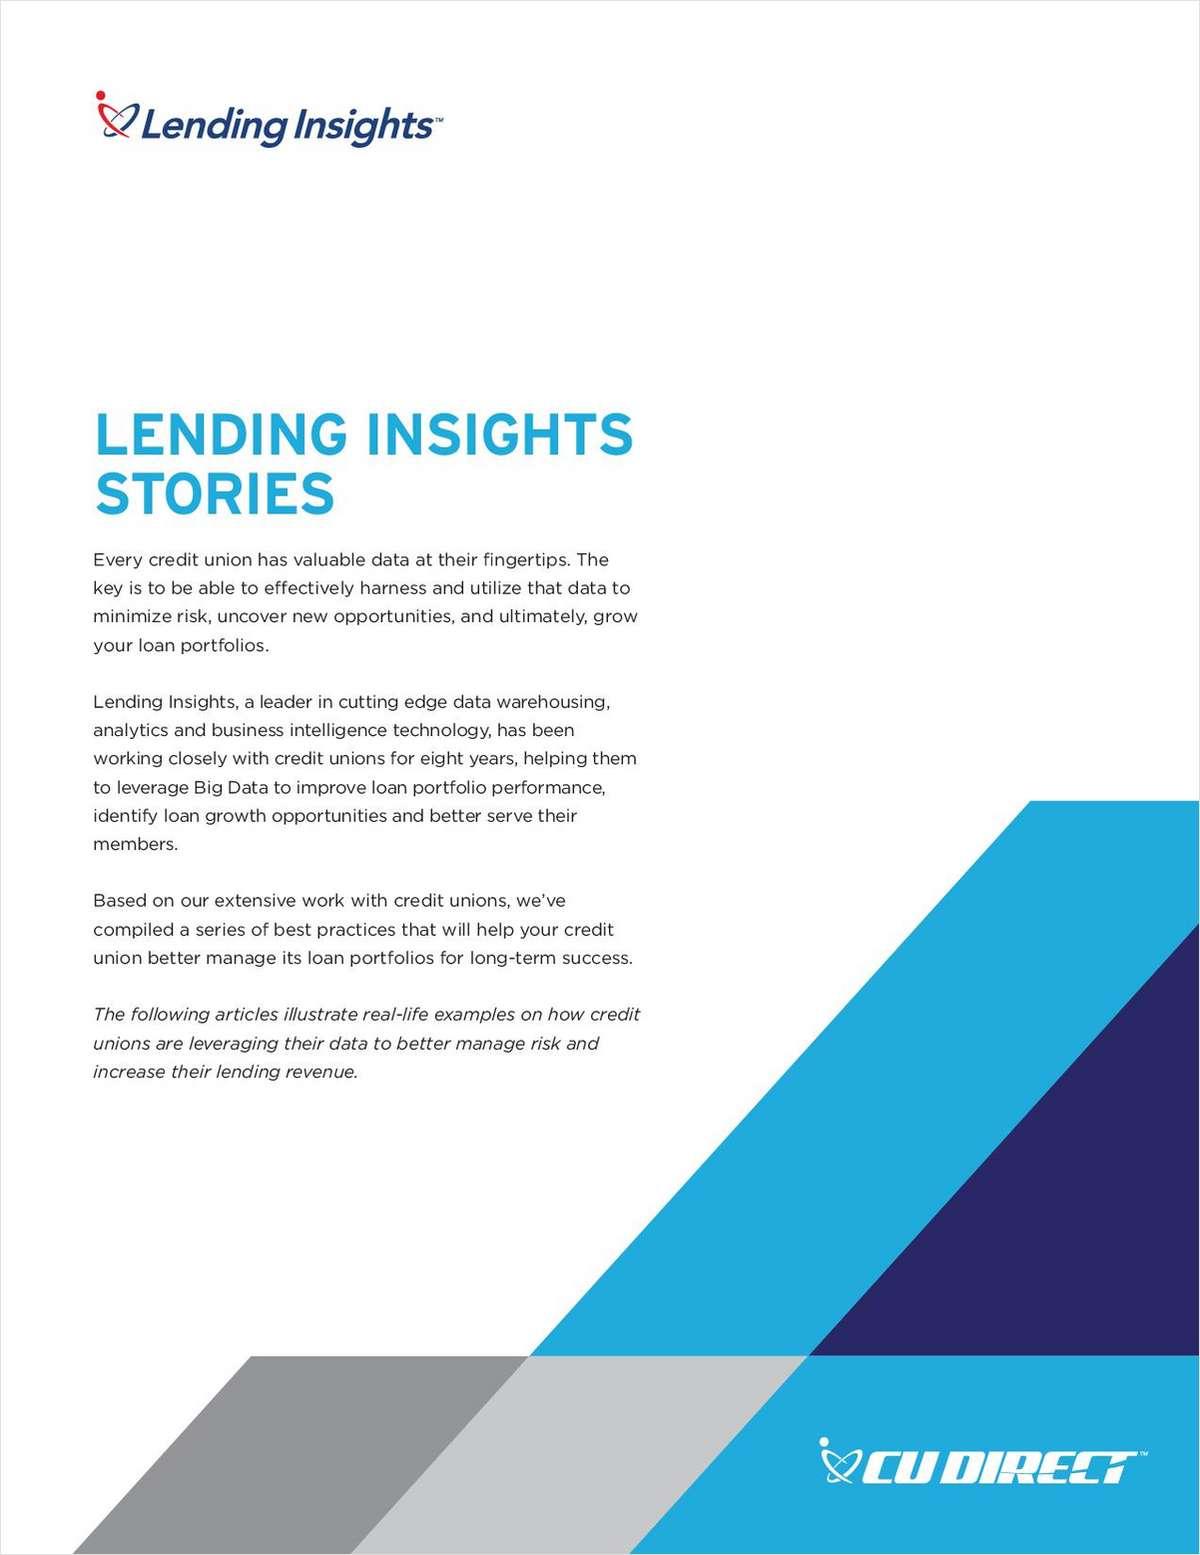 5 Ways to Rev Up Your Lending Revenue